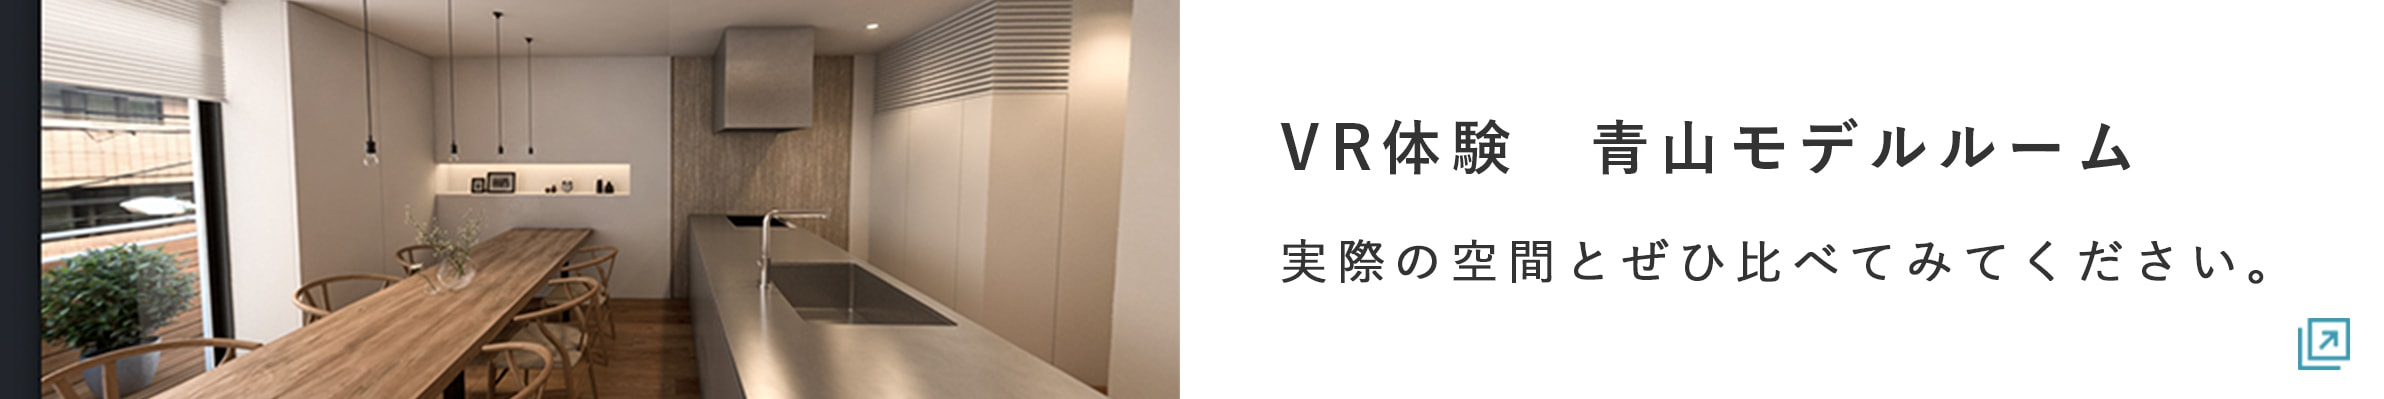 VR体験・青山モデルルーム